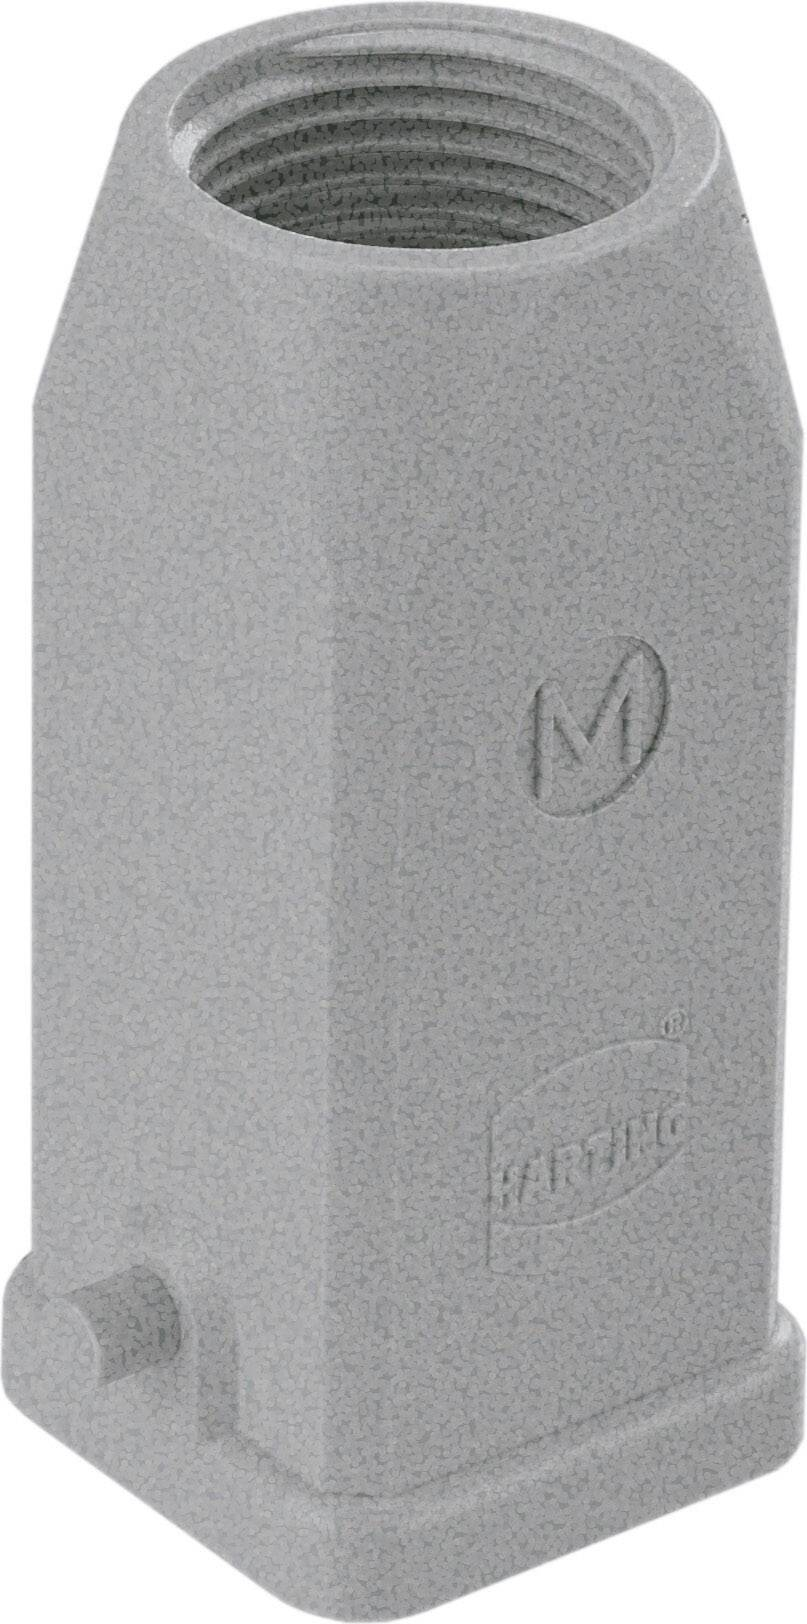 Pouzdro Harting Han® 3A-gg-M20, 19 20 003 1440, 1 ks